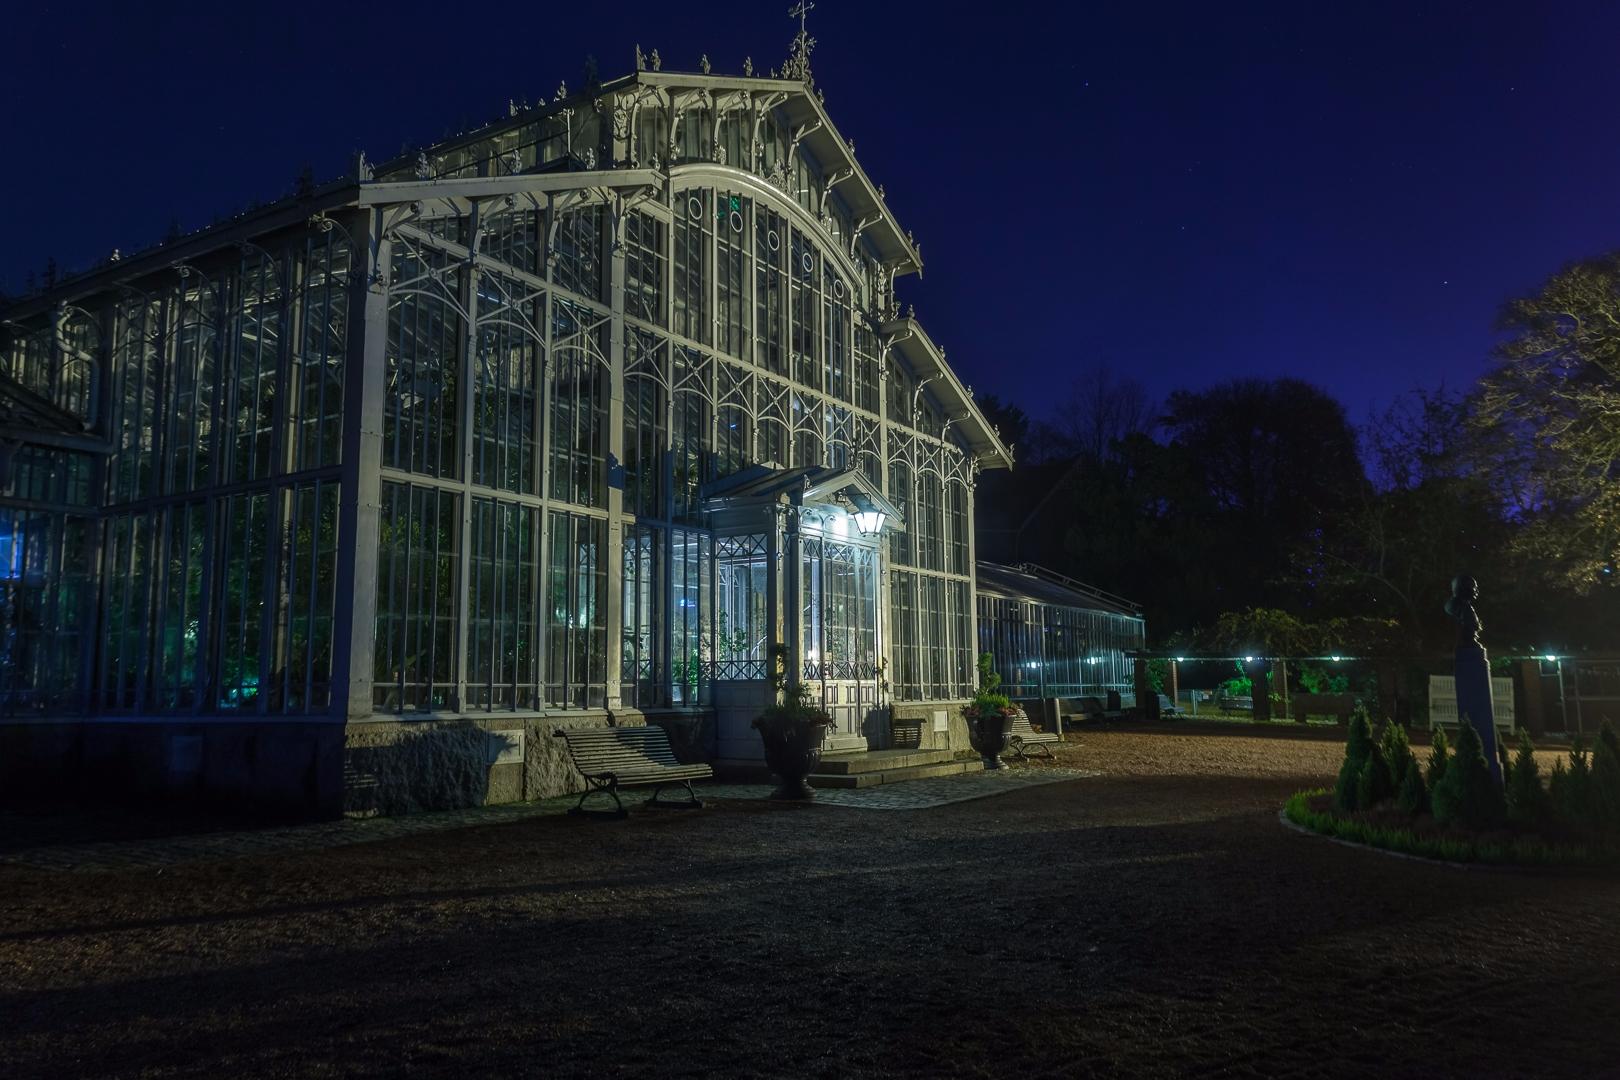 Winter Garden - photography, night - anttitassberg   ello